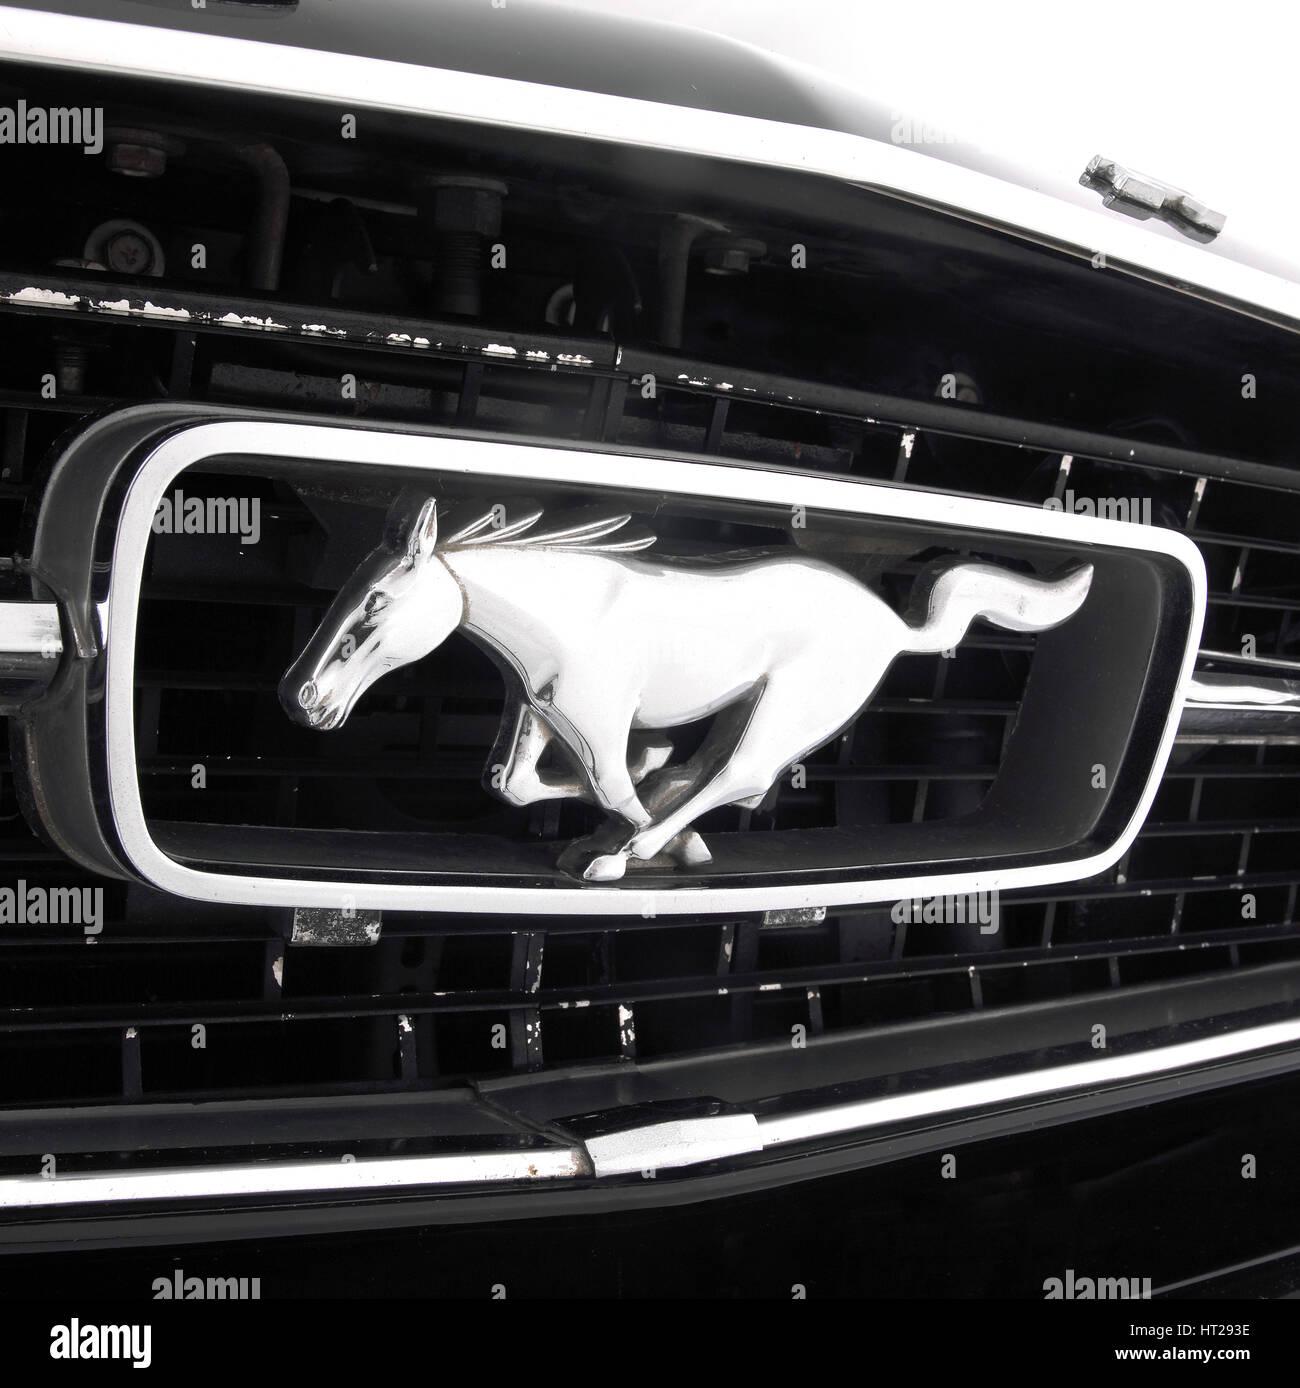 1966 ford Mustang 289 gt Artist: unbekannt. Stockbild